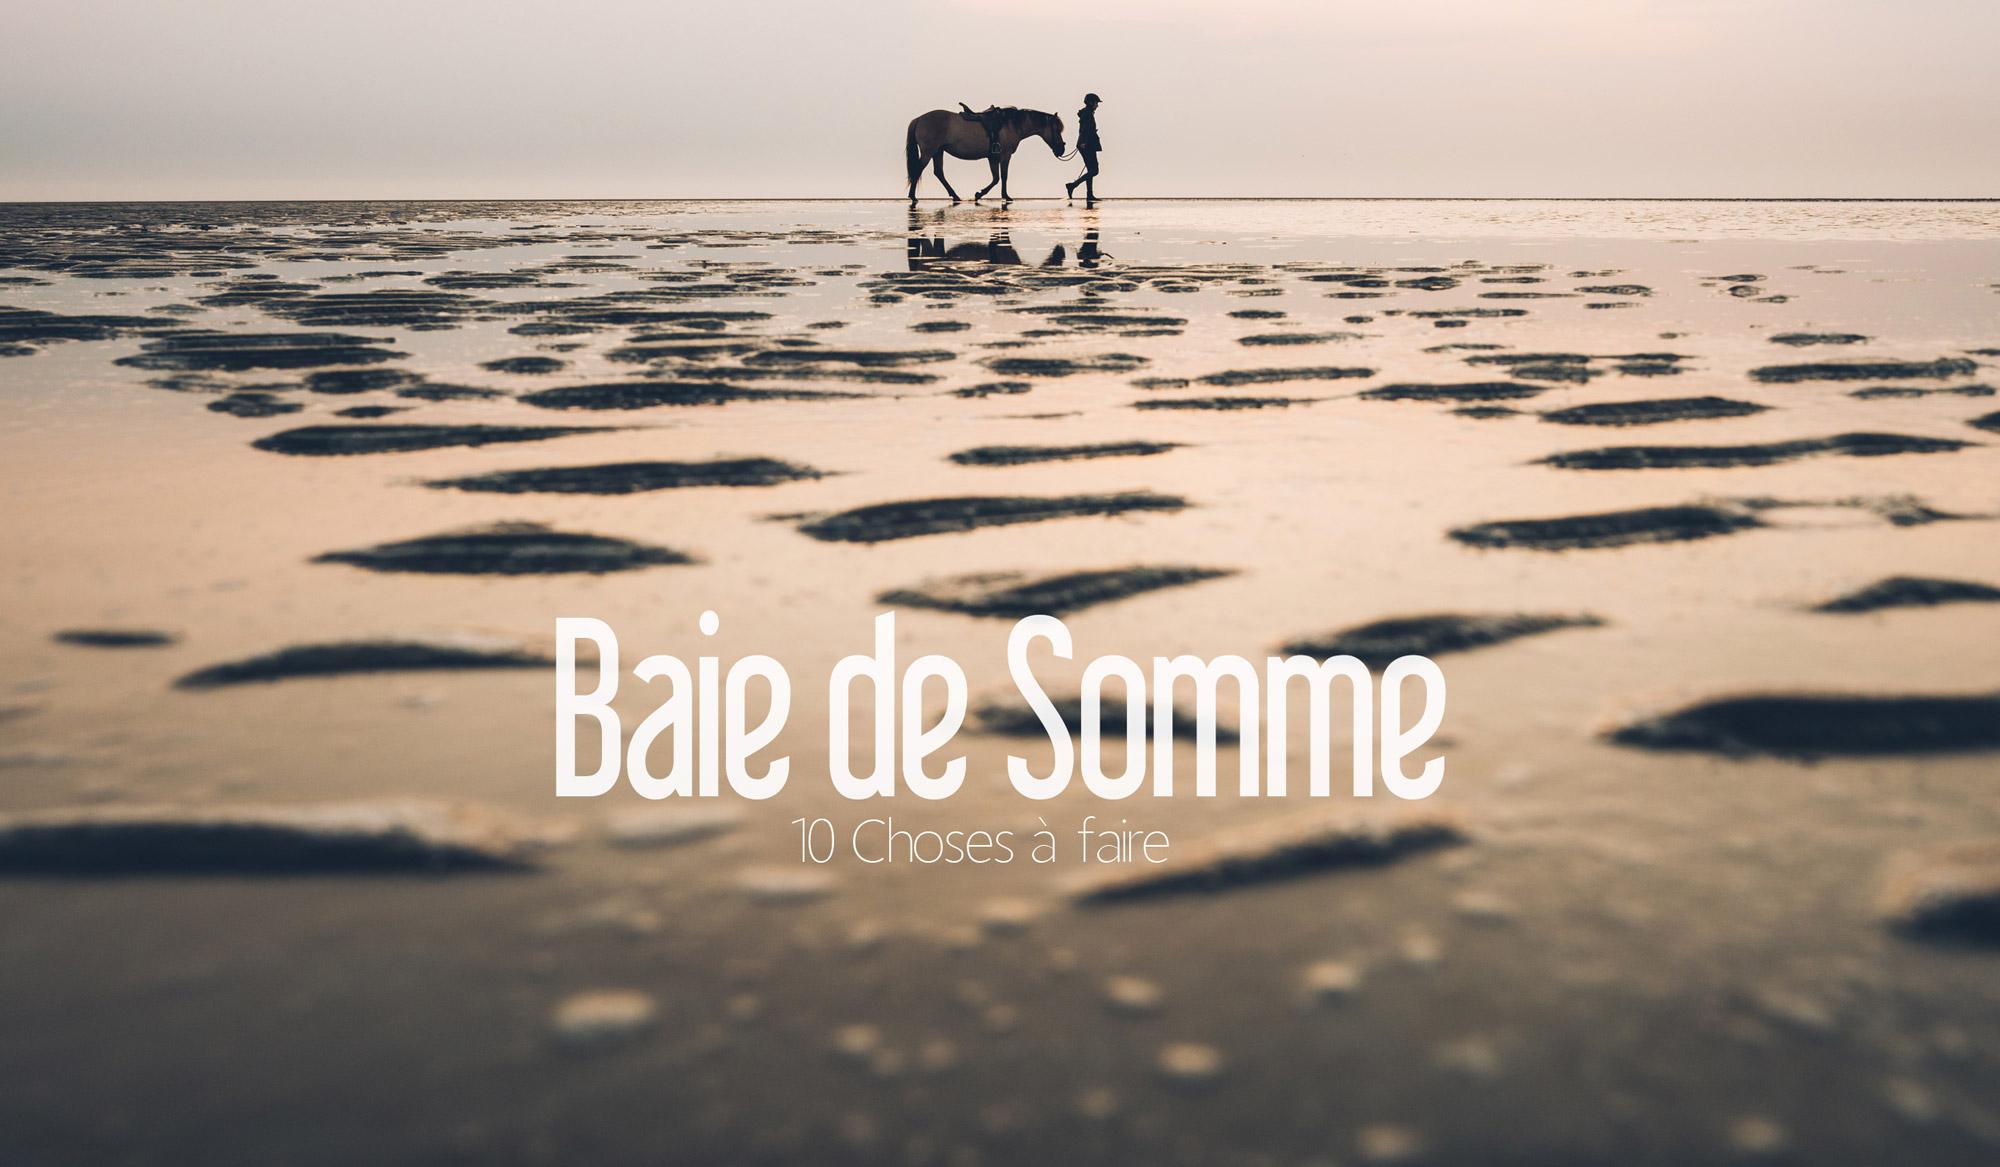 Baie de Somme, Blog Voyage, Notre TOP 10